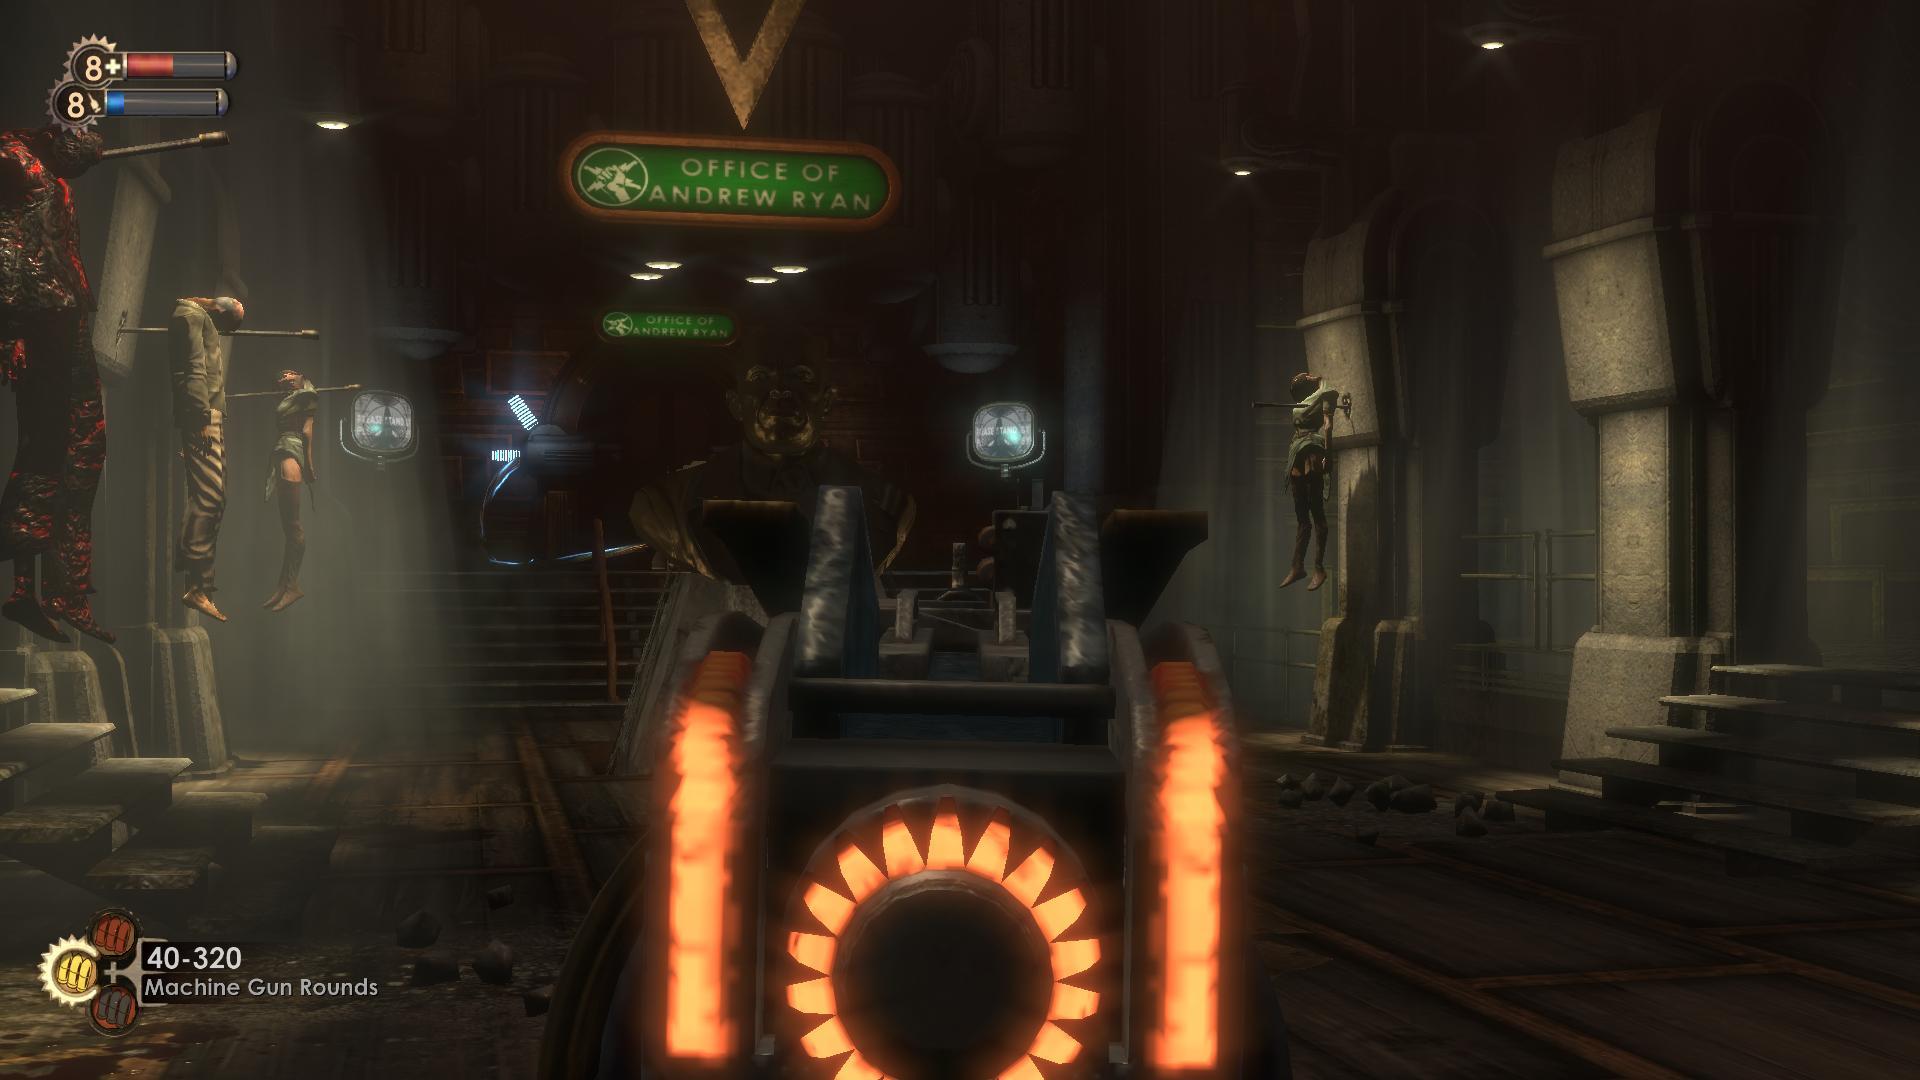 bioshock machine gun